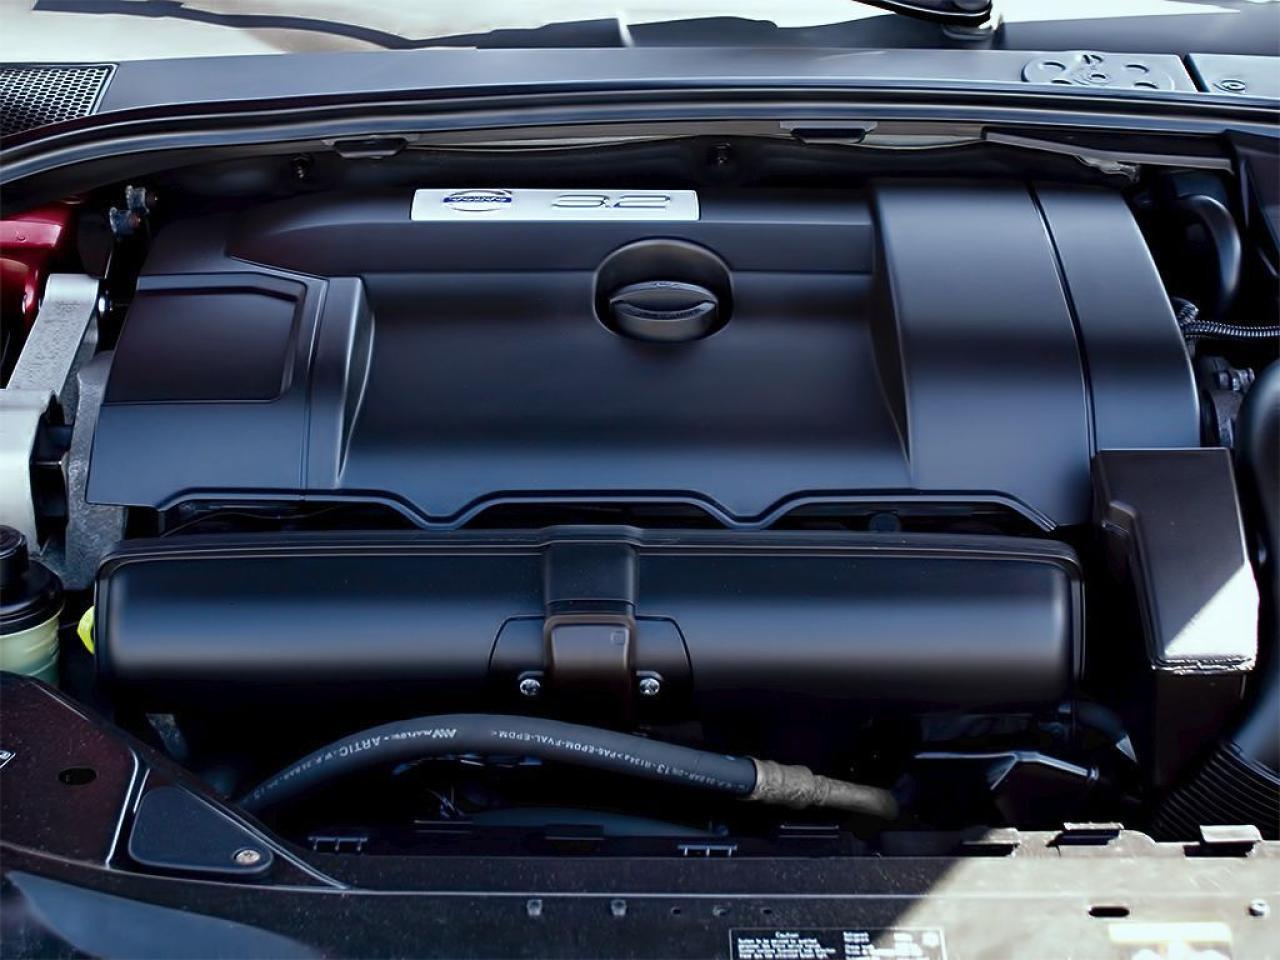 2011 Volvo XC70 3.2|AWD|LEATHER|SUNROOF|ALLOYS|ROORF RACK